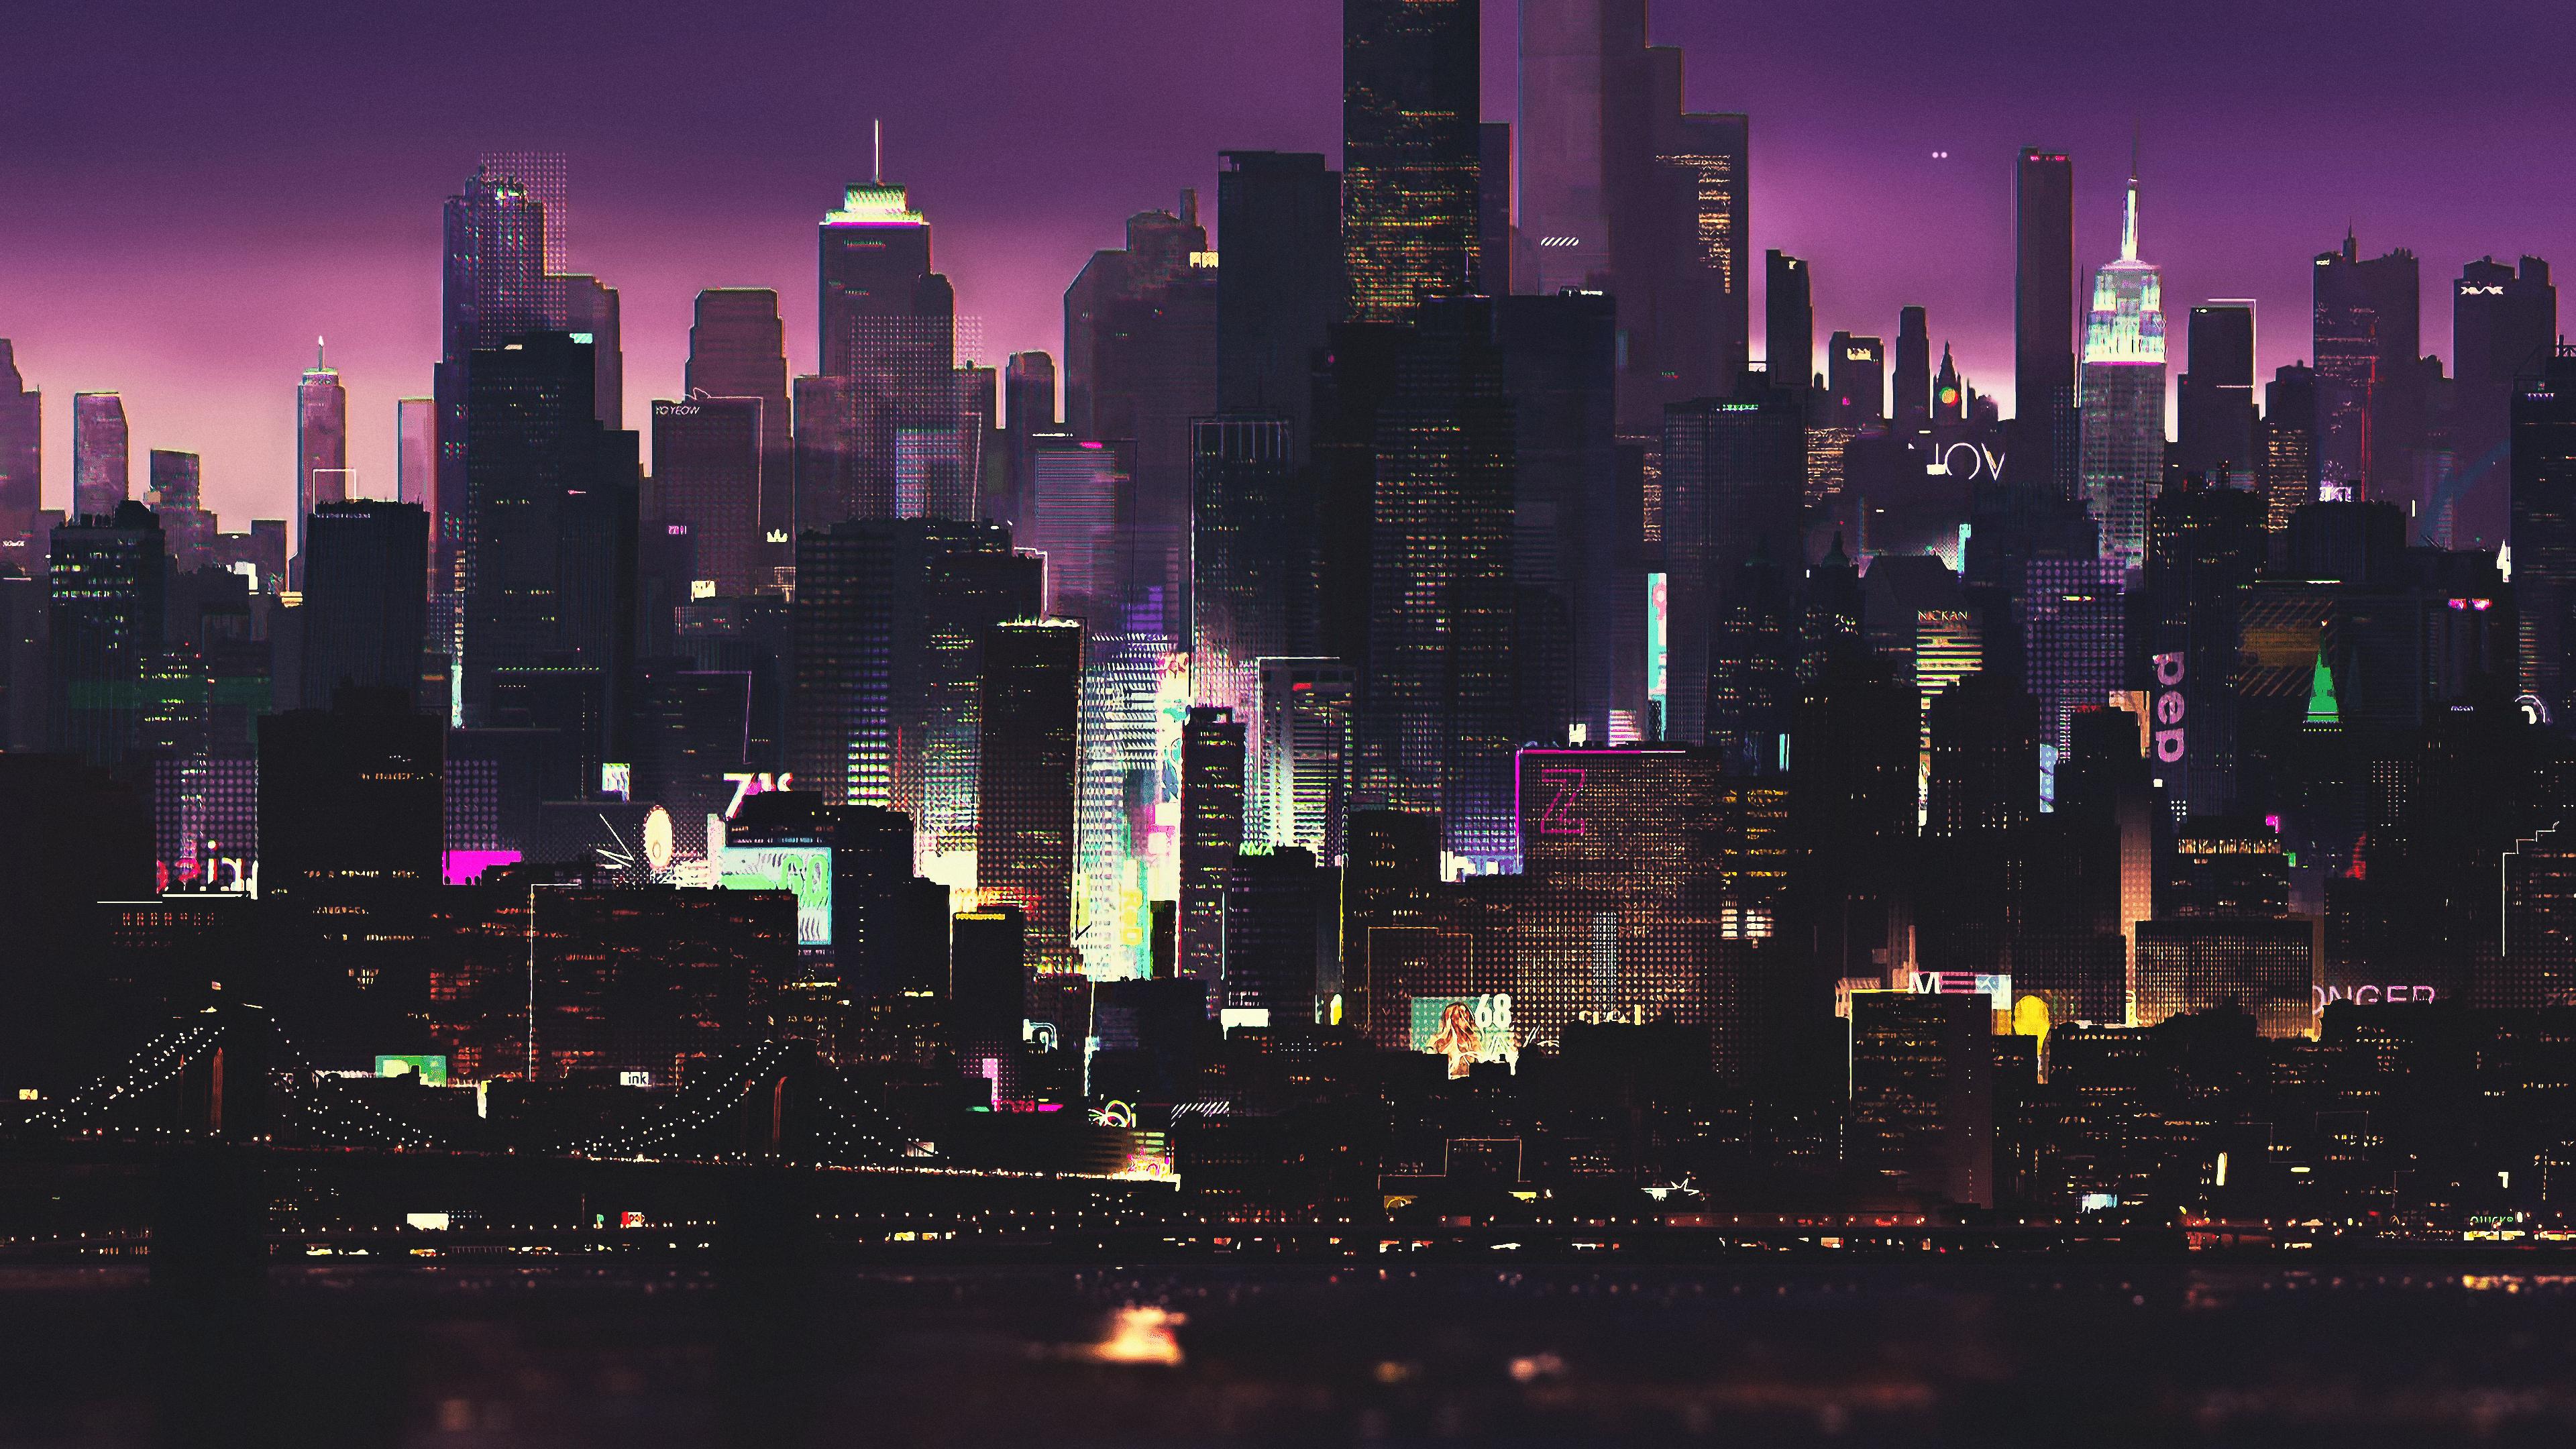 General 3840x2160 night artwork futuristic city cyberpunk cyber science fiction digital art concept art fantasy art CGI fan art